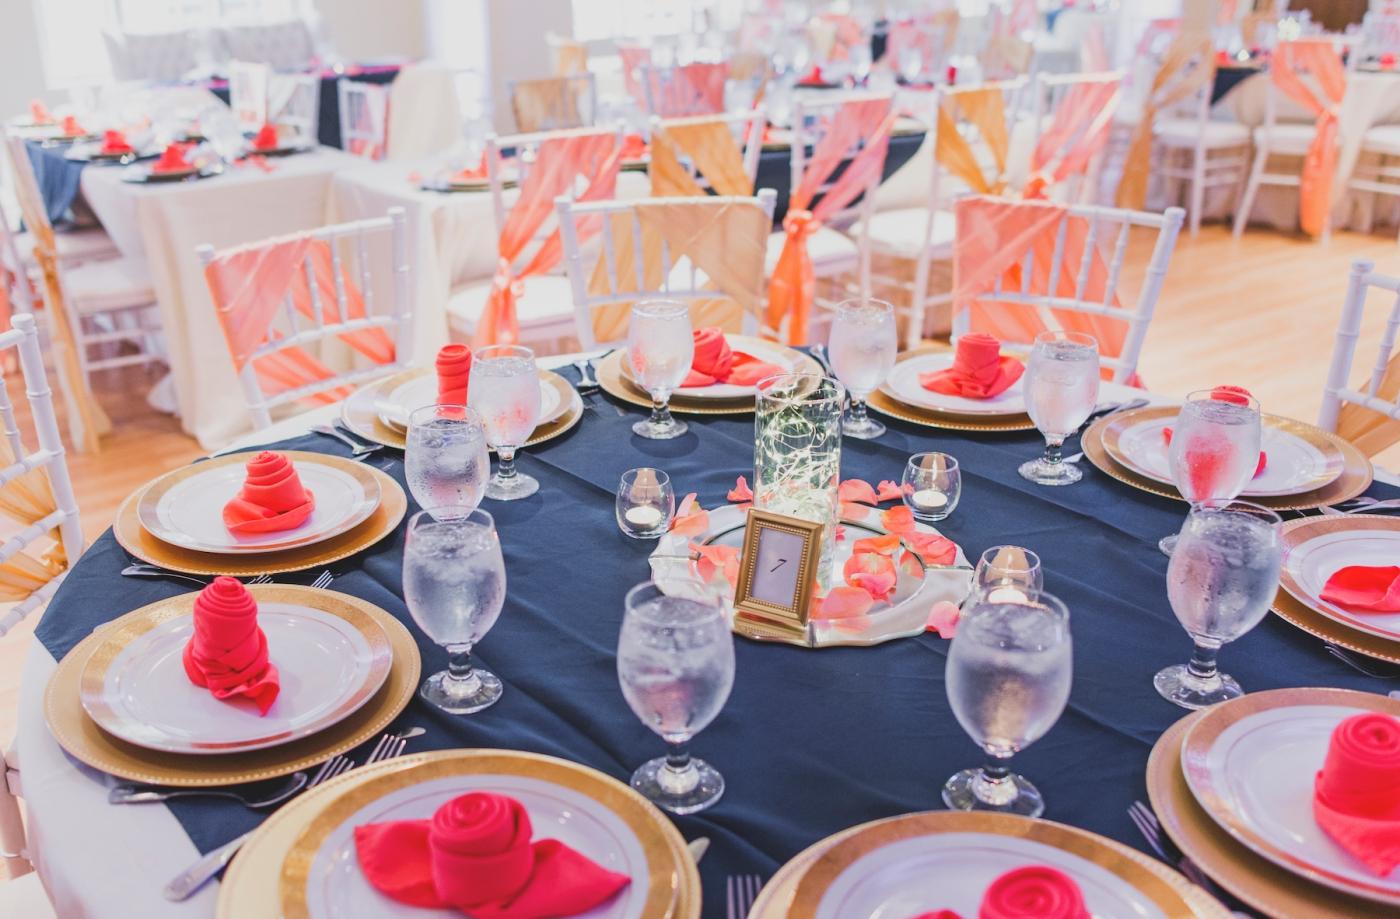 DSC_3069Everett_Wedding_Ballroom_Jane_Speleers_photography_Rachel_and_Edmund_cake cutting_2017